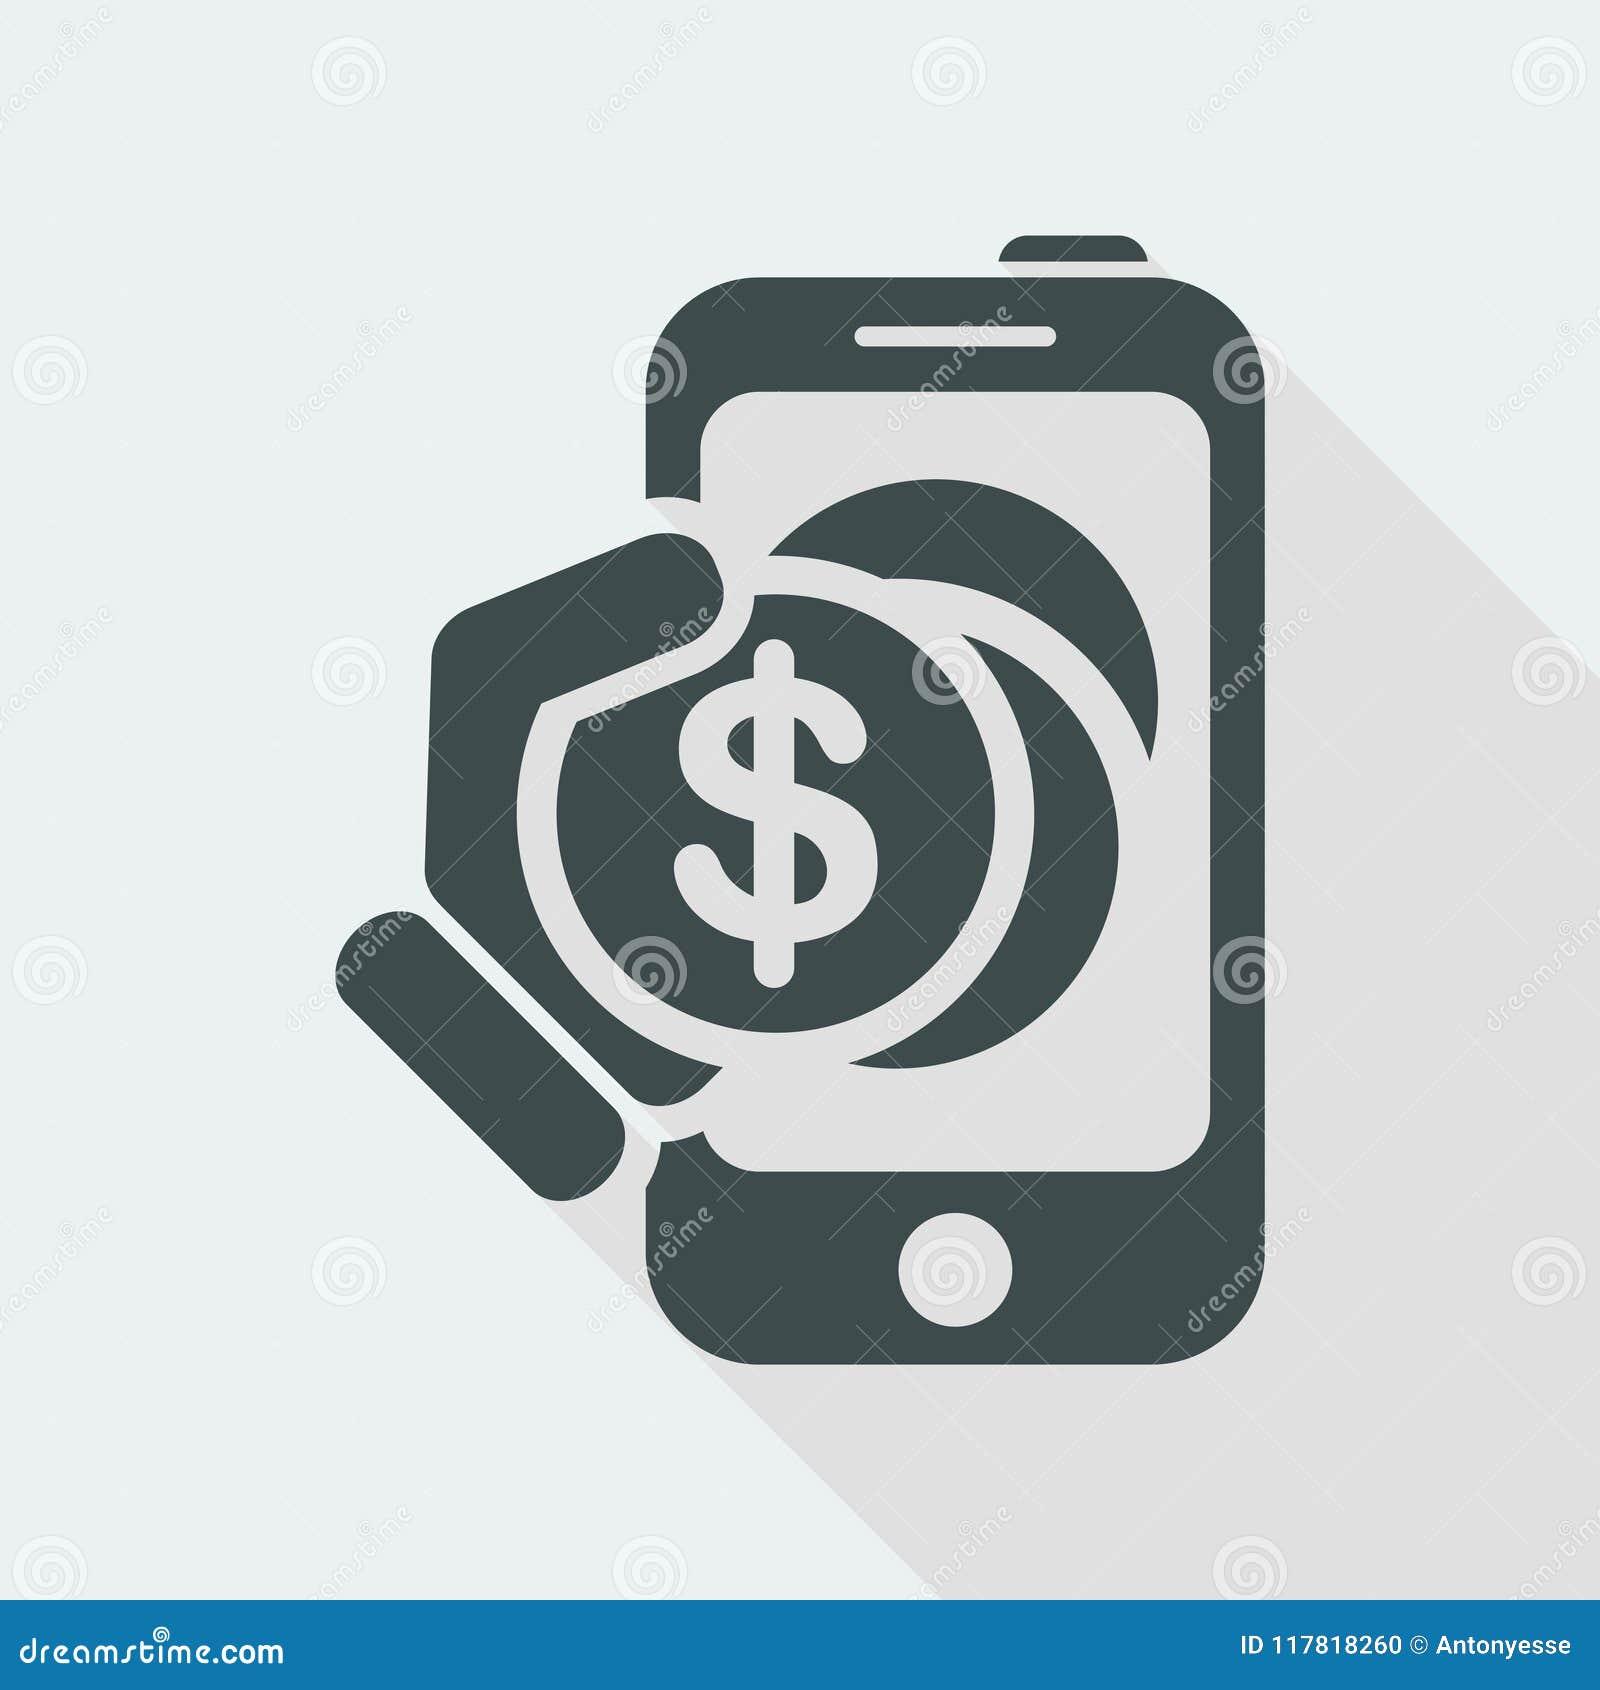 Phone Tariff Plan Stock Vector Illustration Of Phone